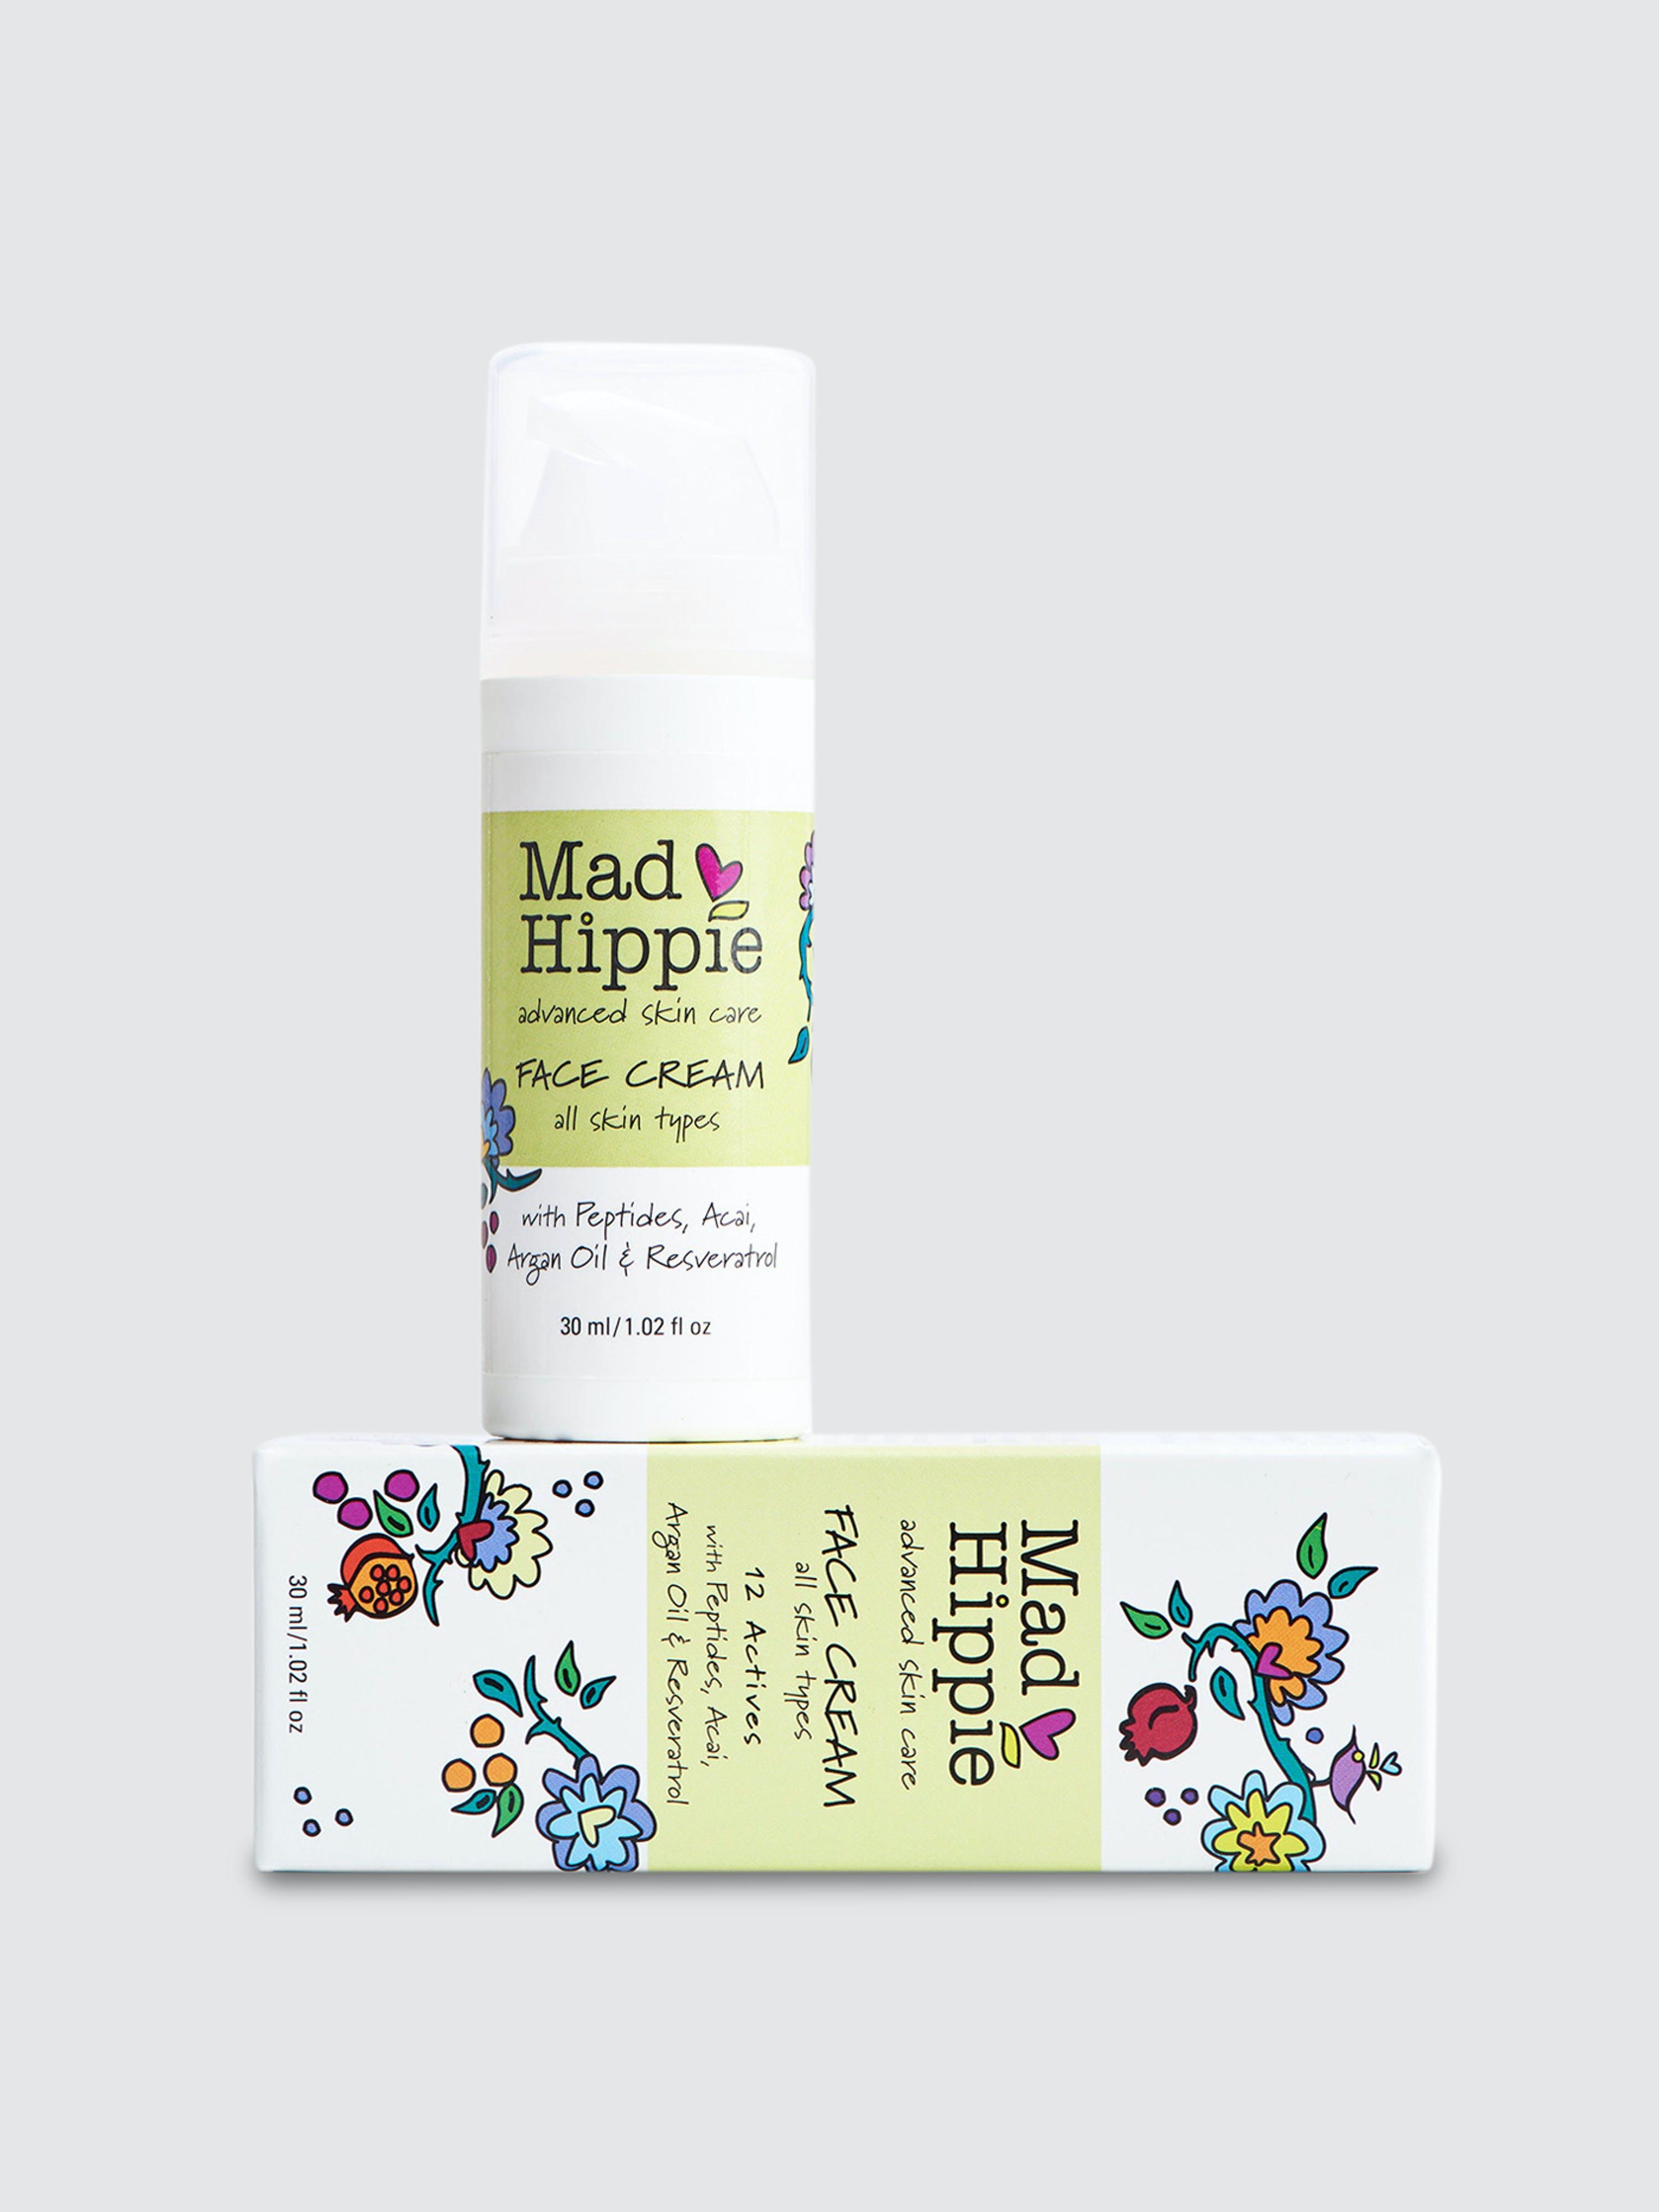 Mad Hippie Face Cream - 1/02/OZ